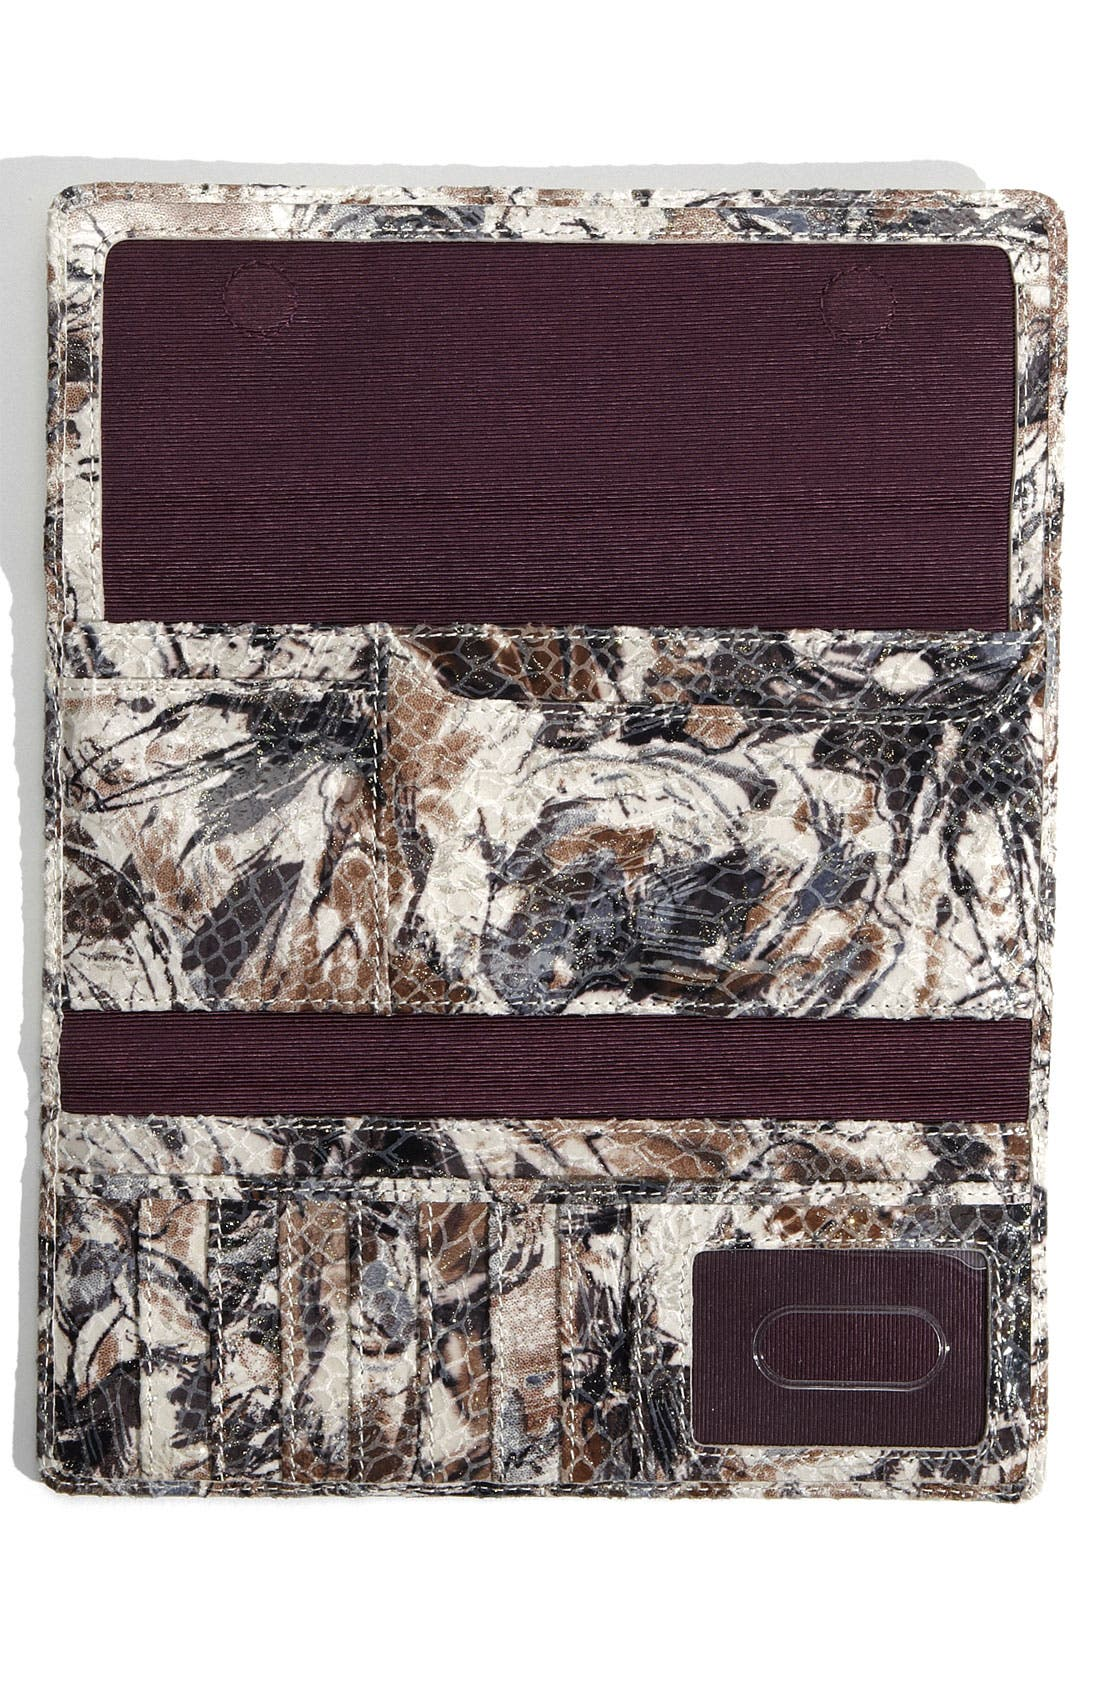 'Sadie' Leather Wallet,                             Alternate thumbnail 121, color,